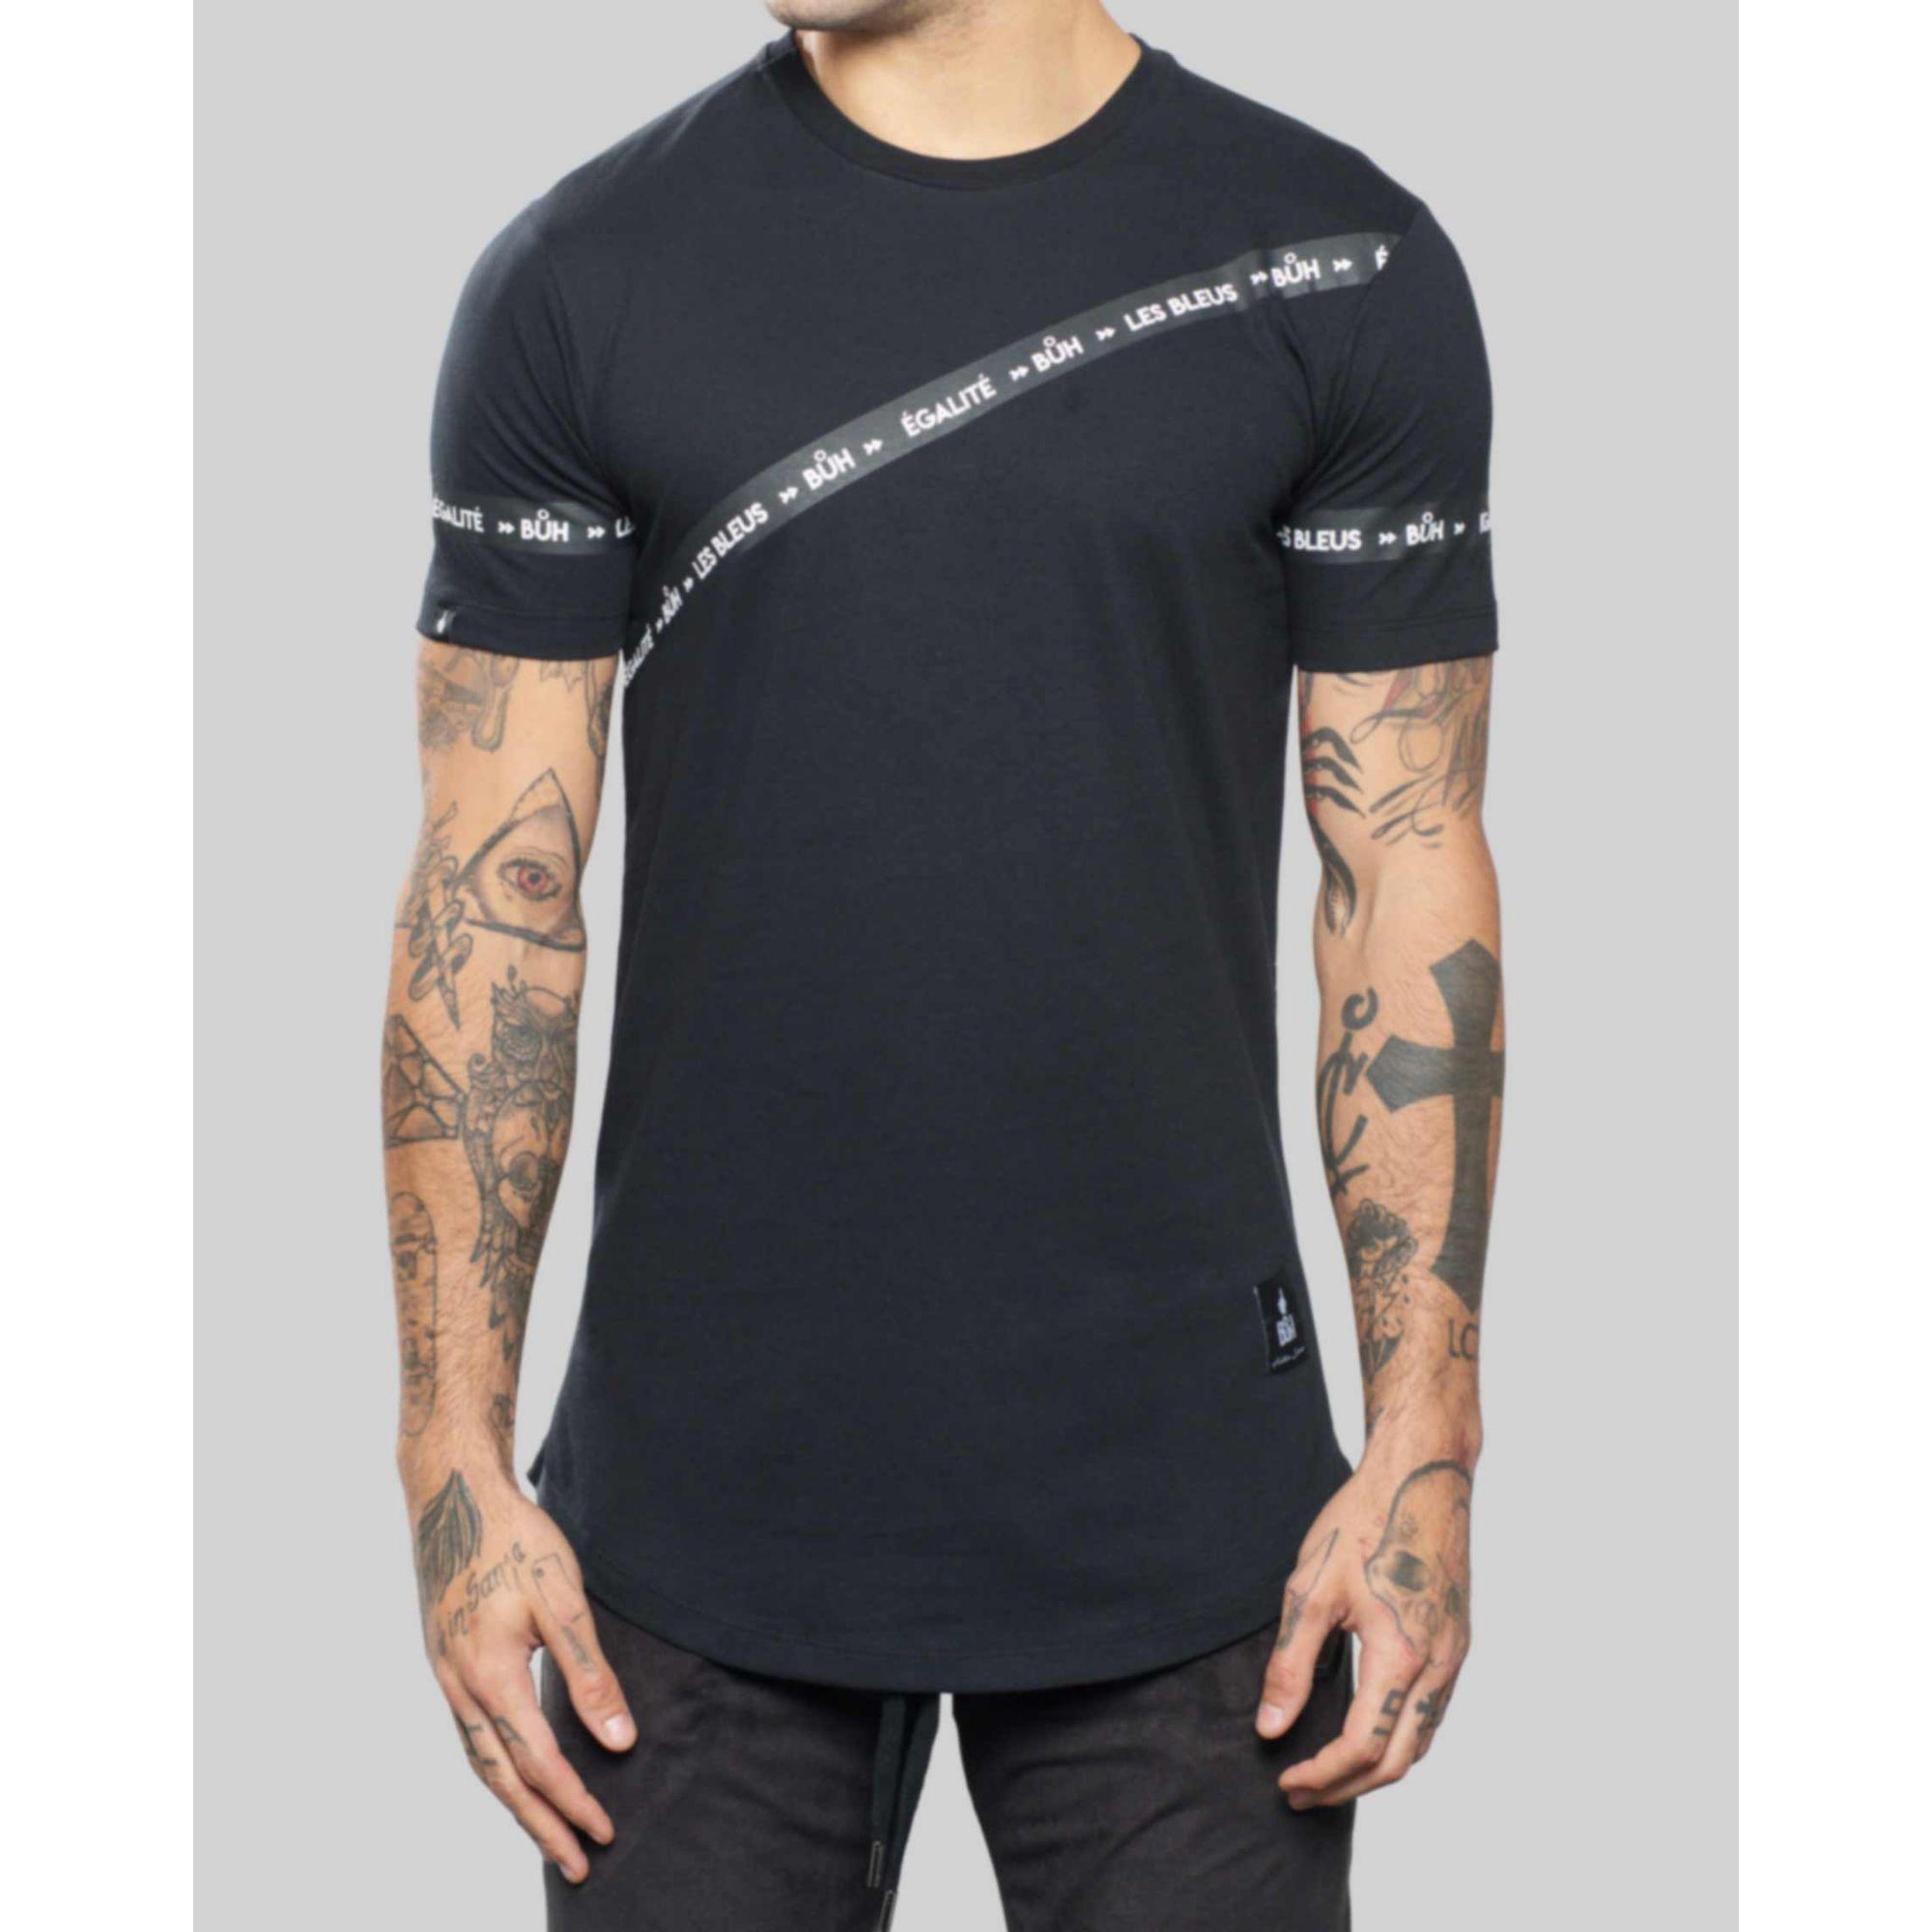 Camiseta Buh Faixa Egalité Black